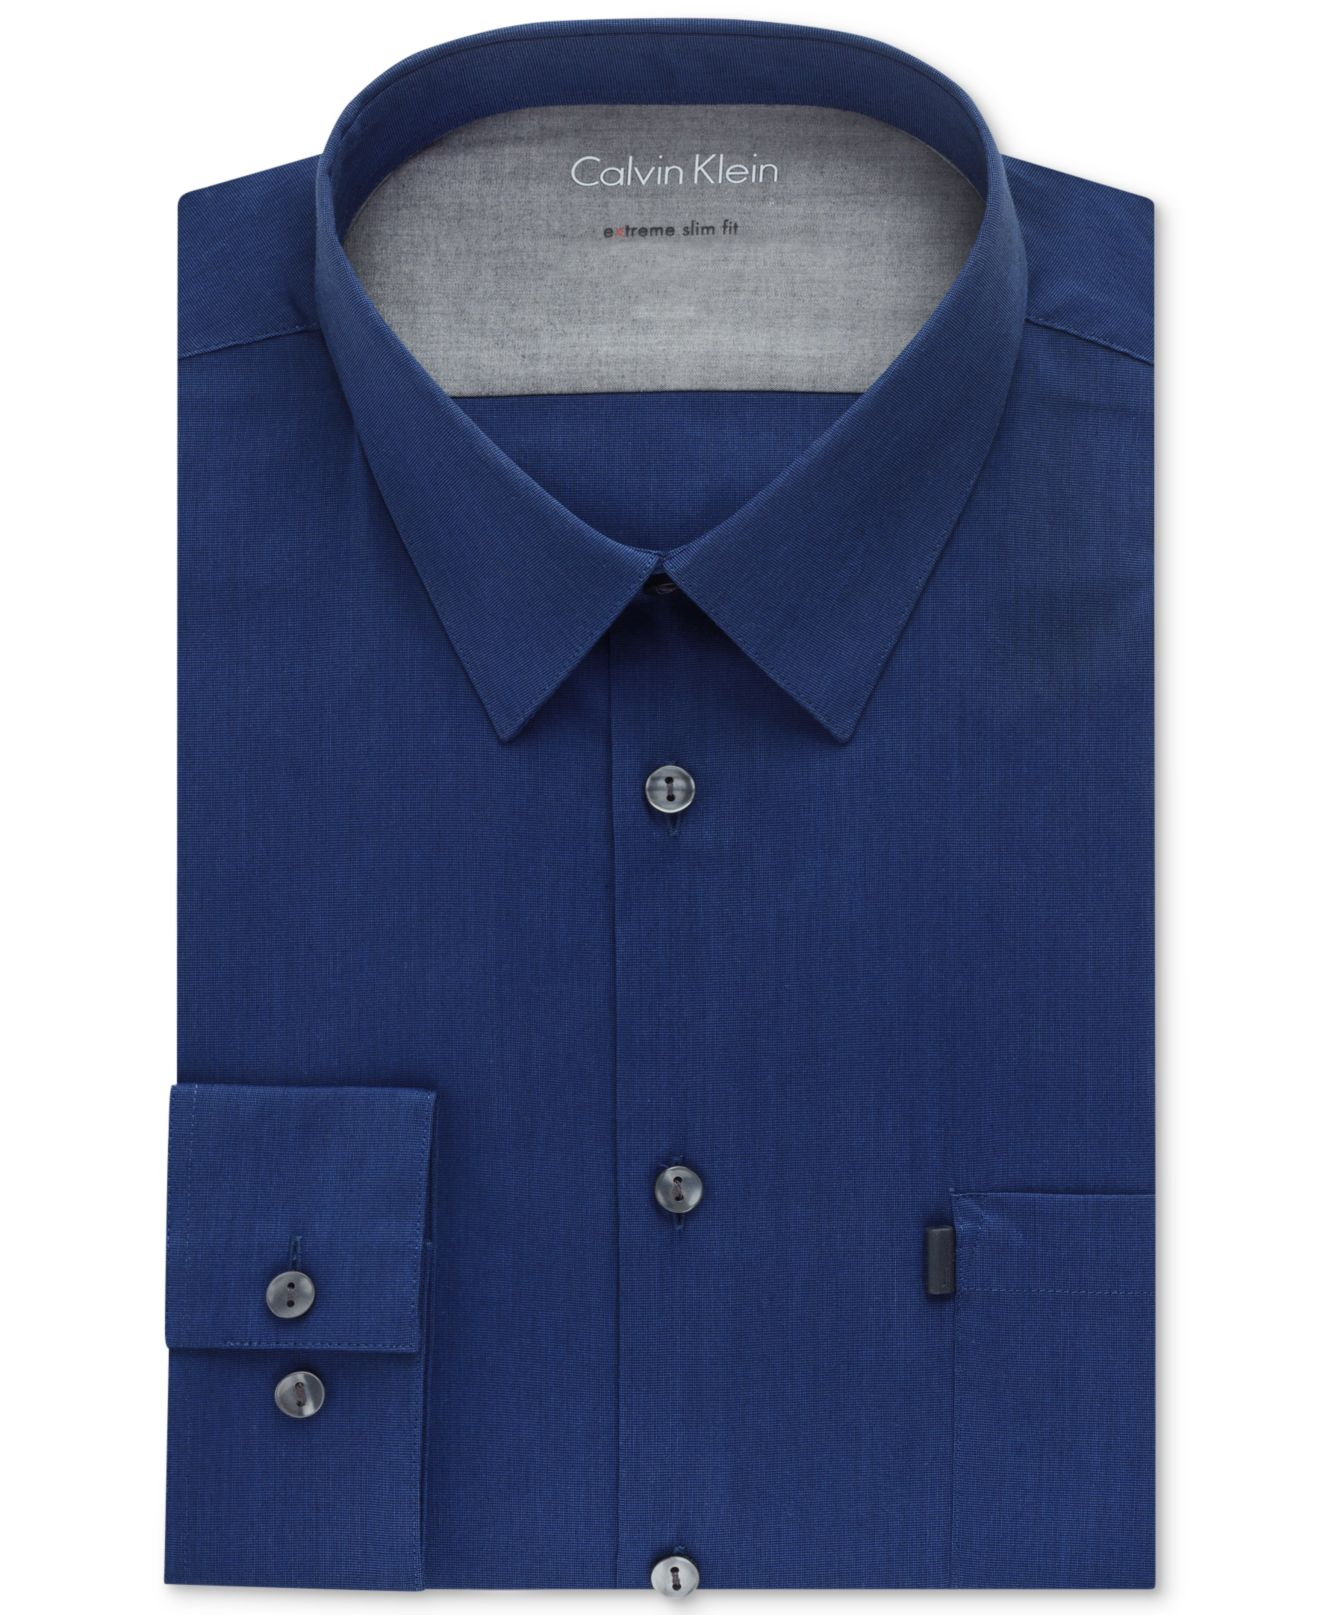 Lyst calvin klein x extra slim fit stretch solid dress for Calvin klein x fit dress shirt